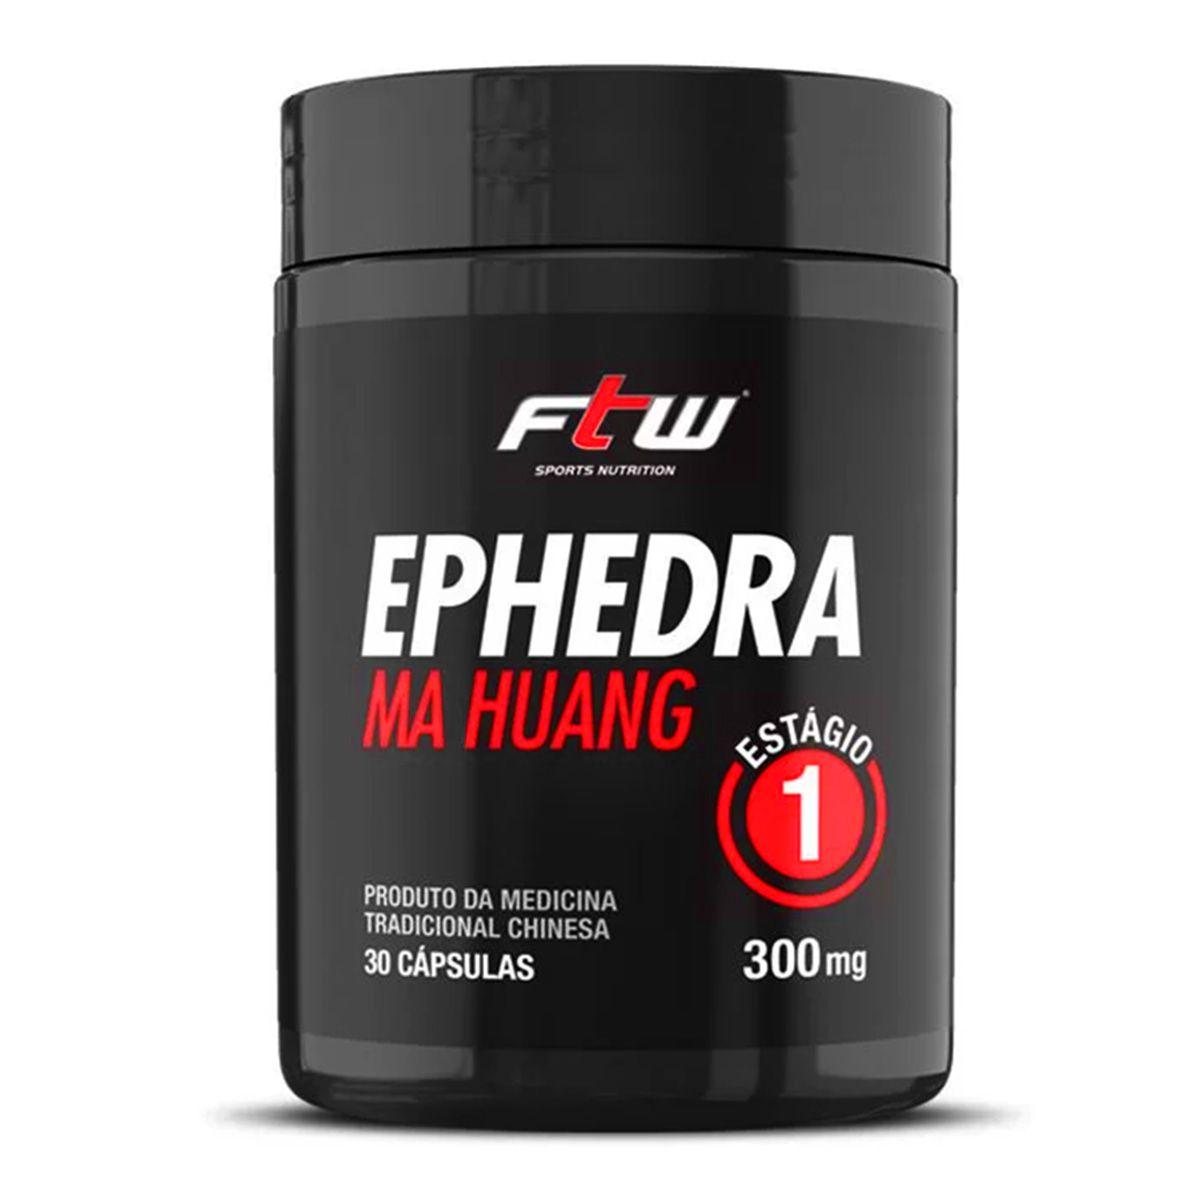 Ephedra Ma Huang 300mg - 30 Cápsulas - FTW